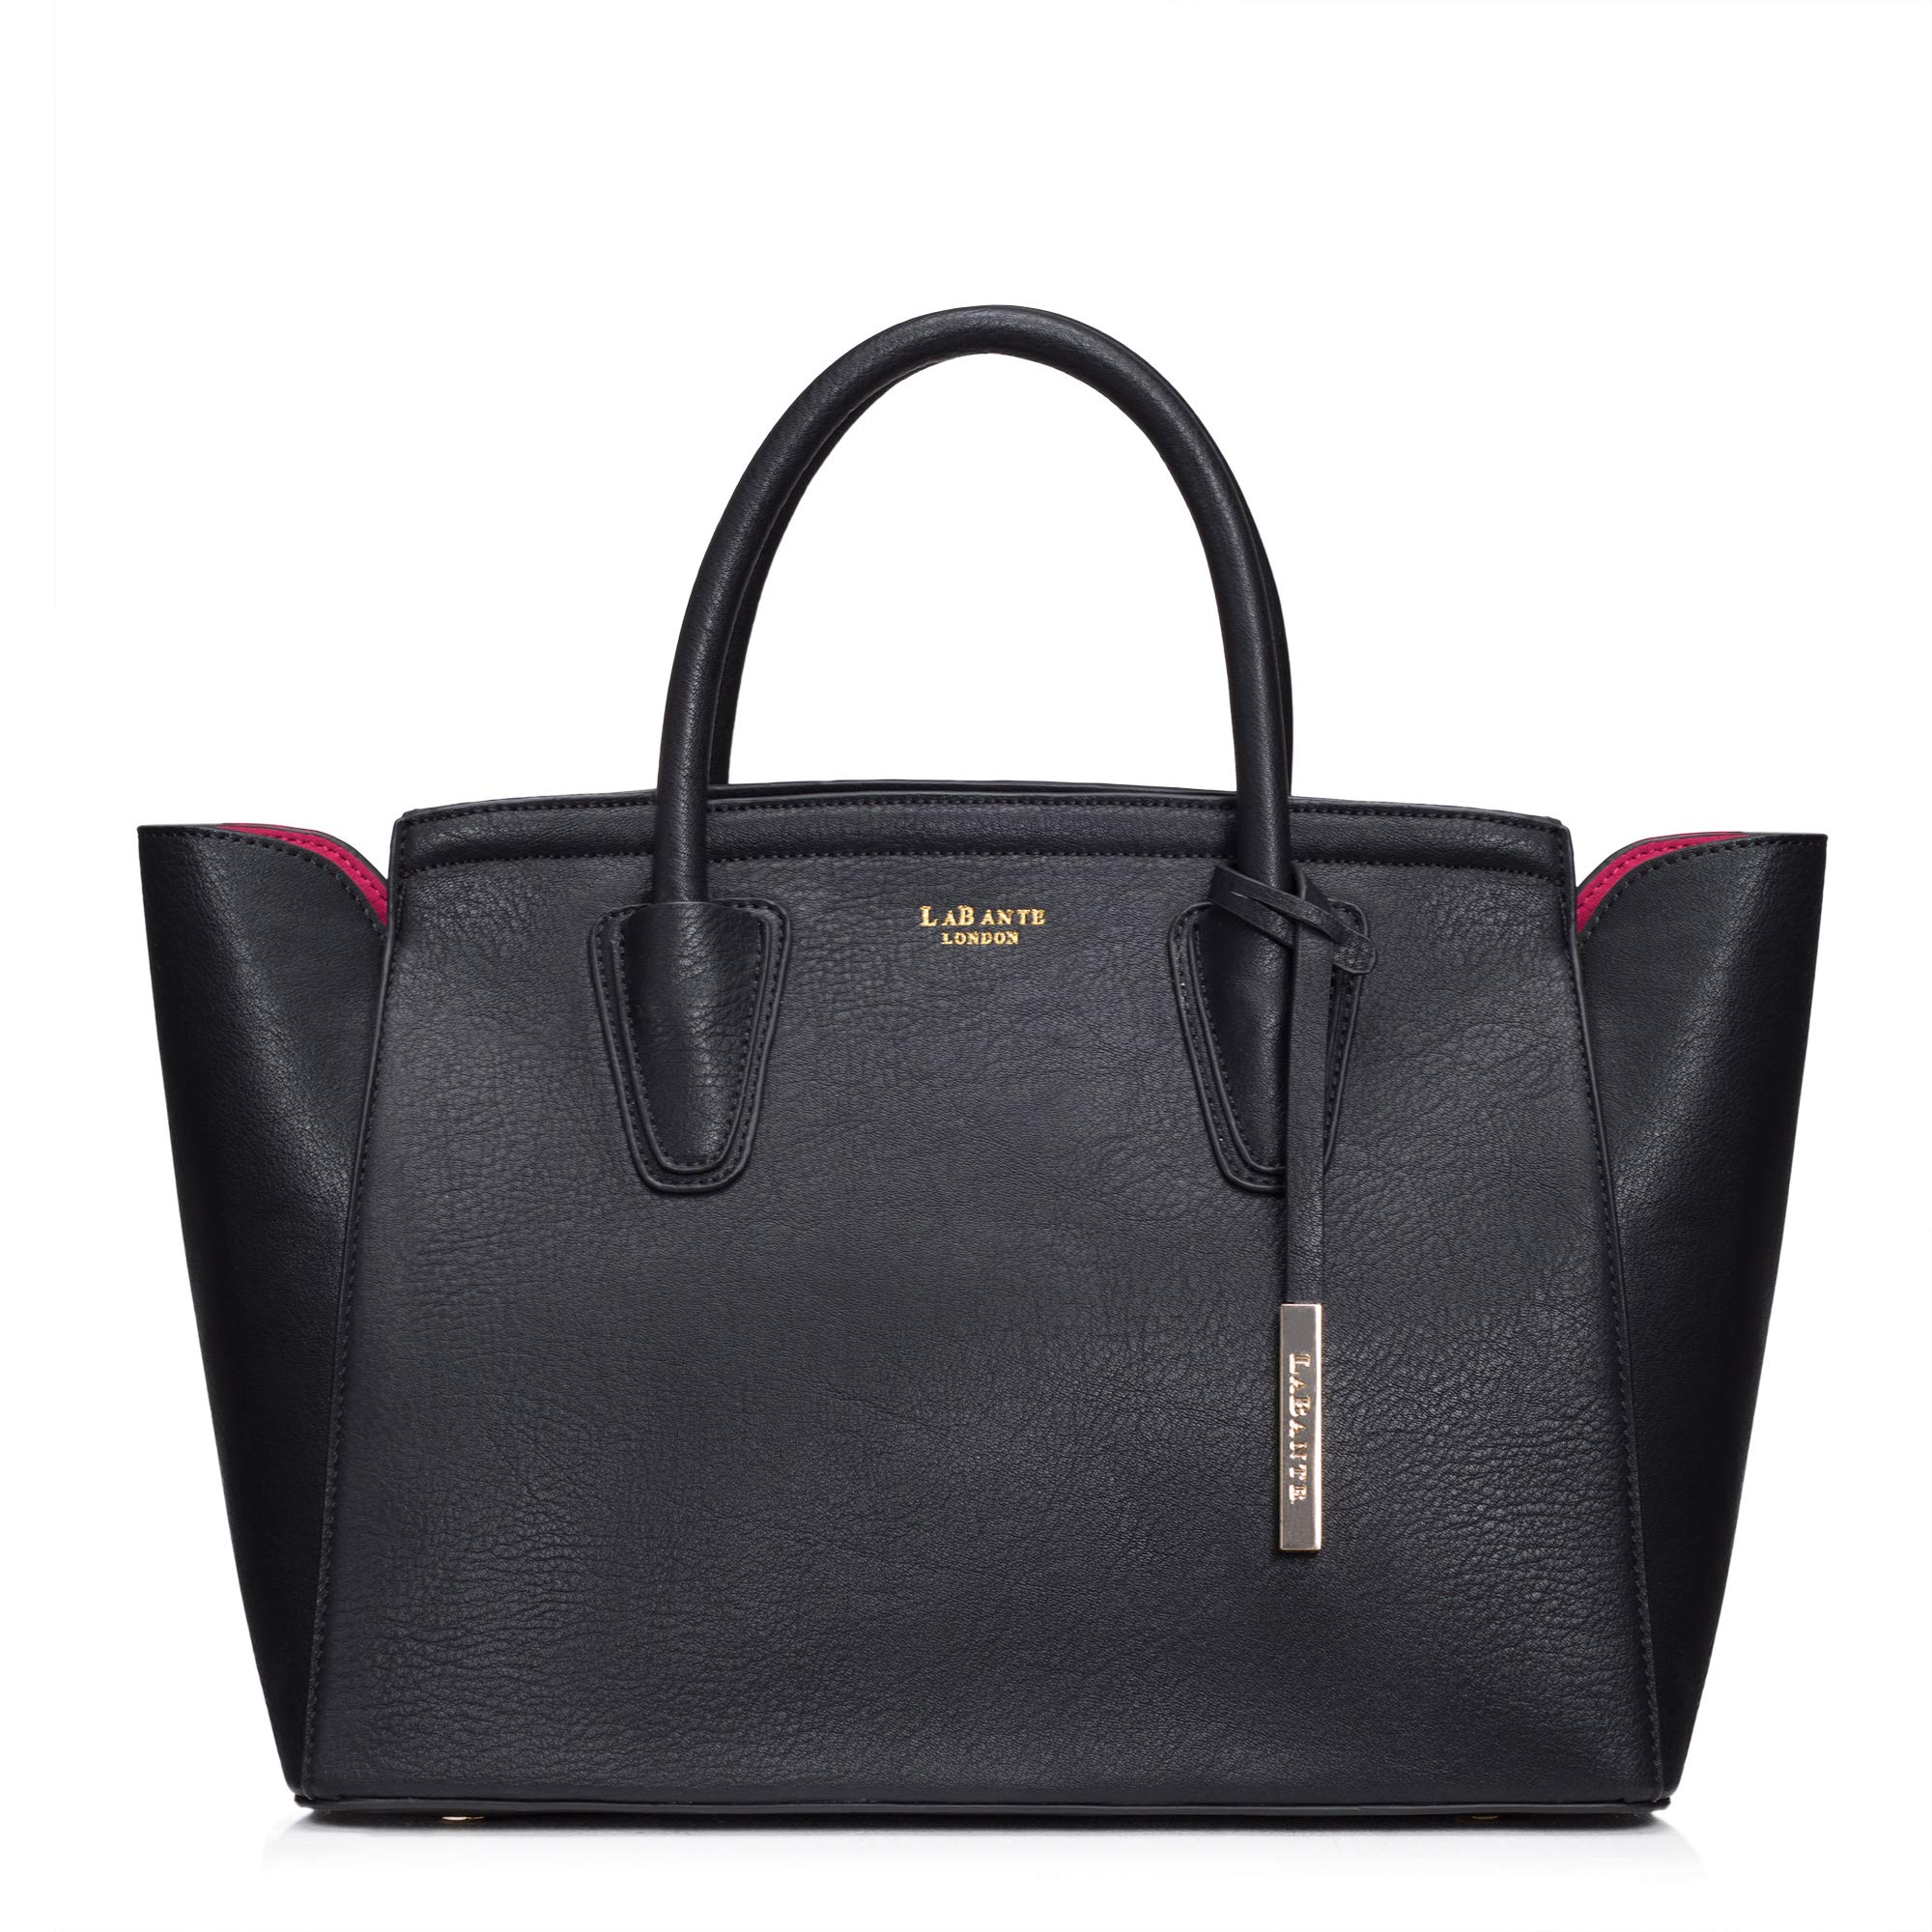 LaBante London 'Grant' Vegan Leather Carryall Laptop Bag for Women (Black)